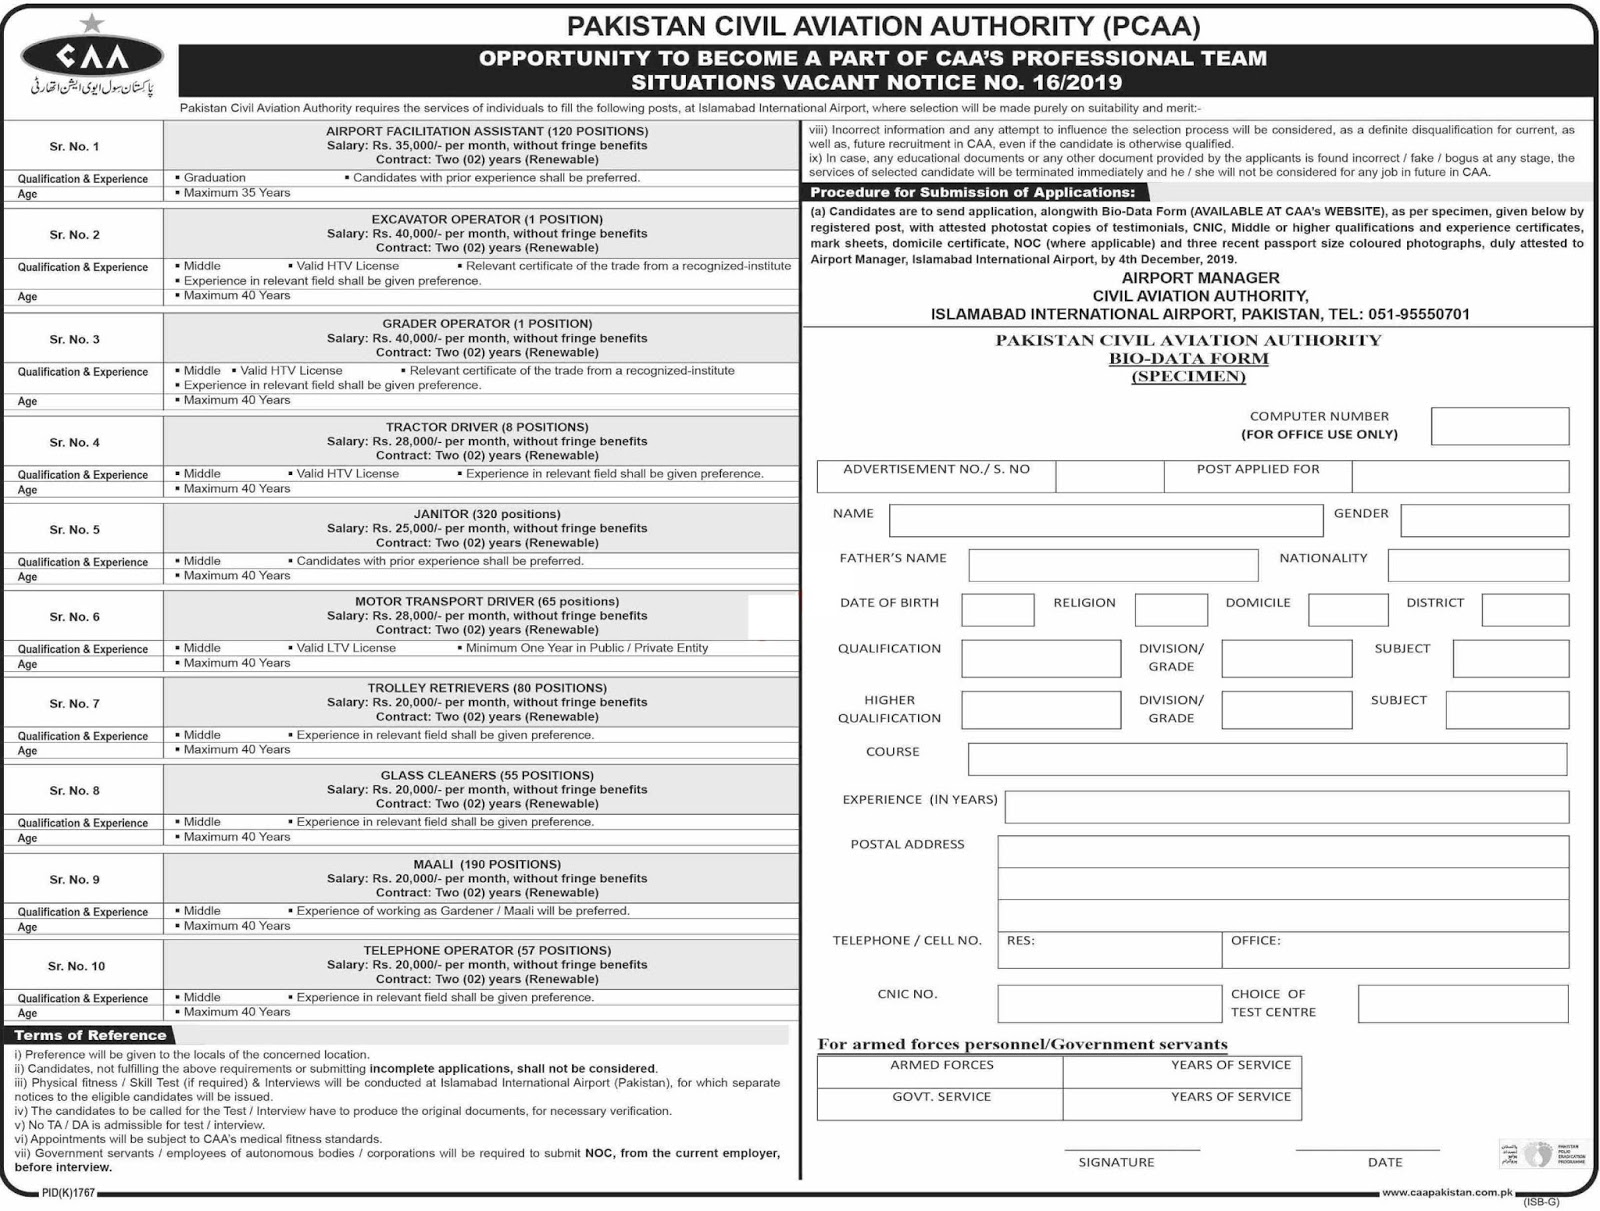 890+ Posts in Pakistan Civil Aviation Authority PCAA Islamabad Jobs 2019